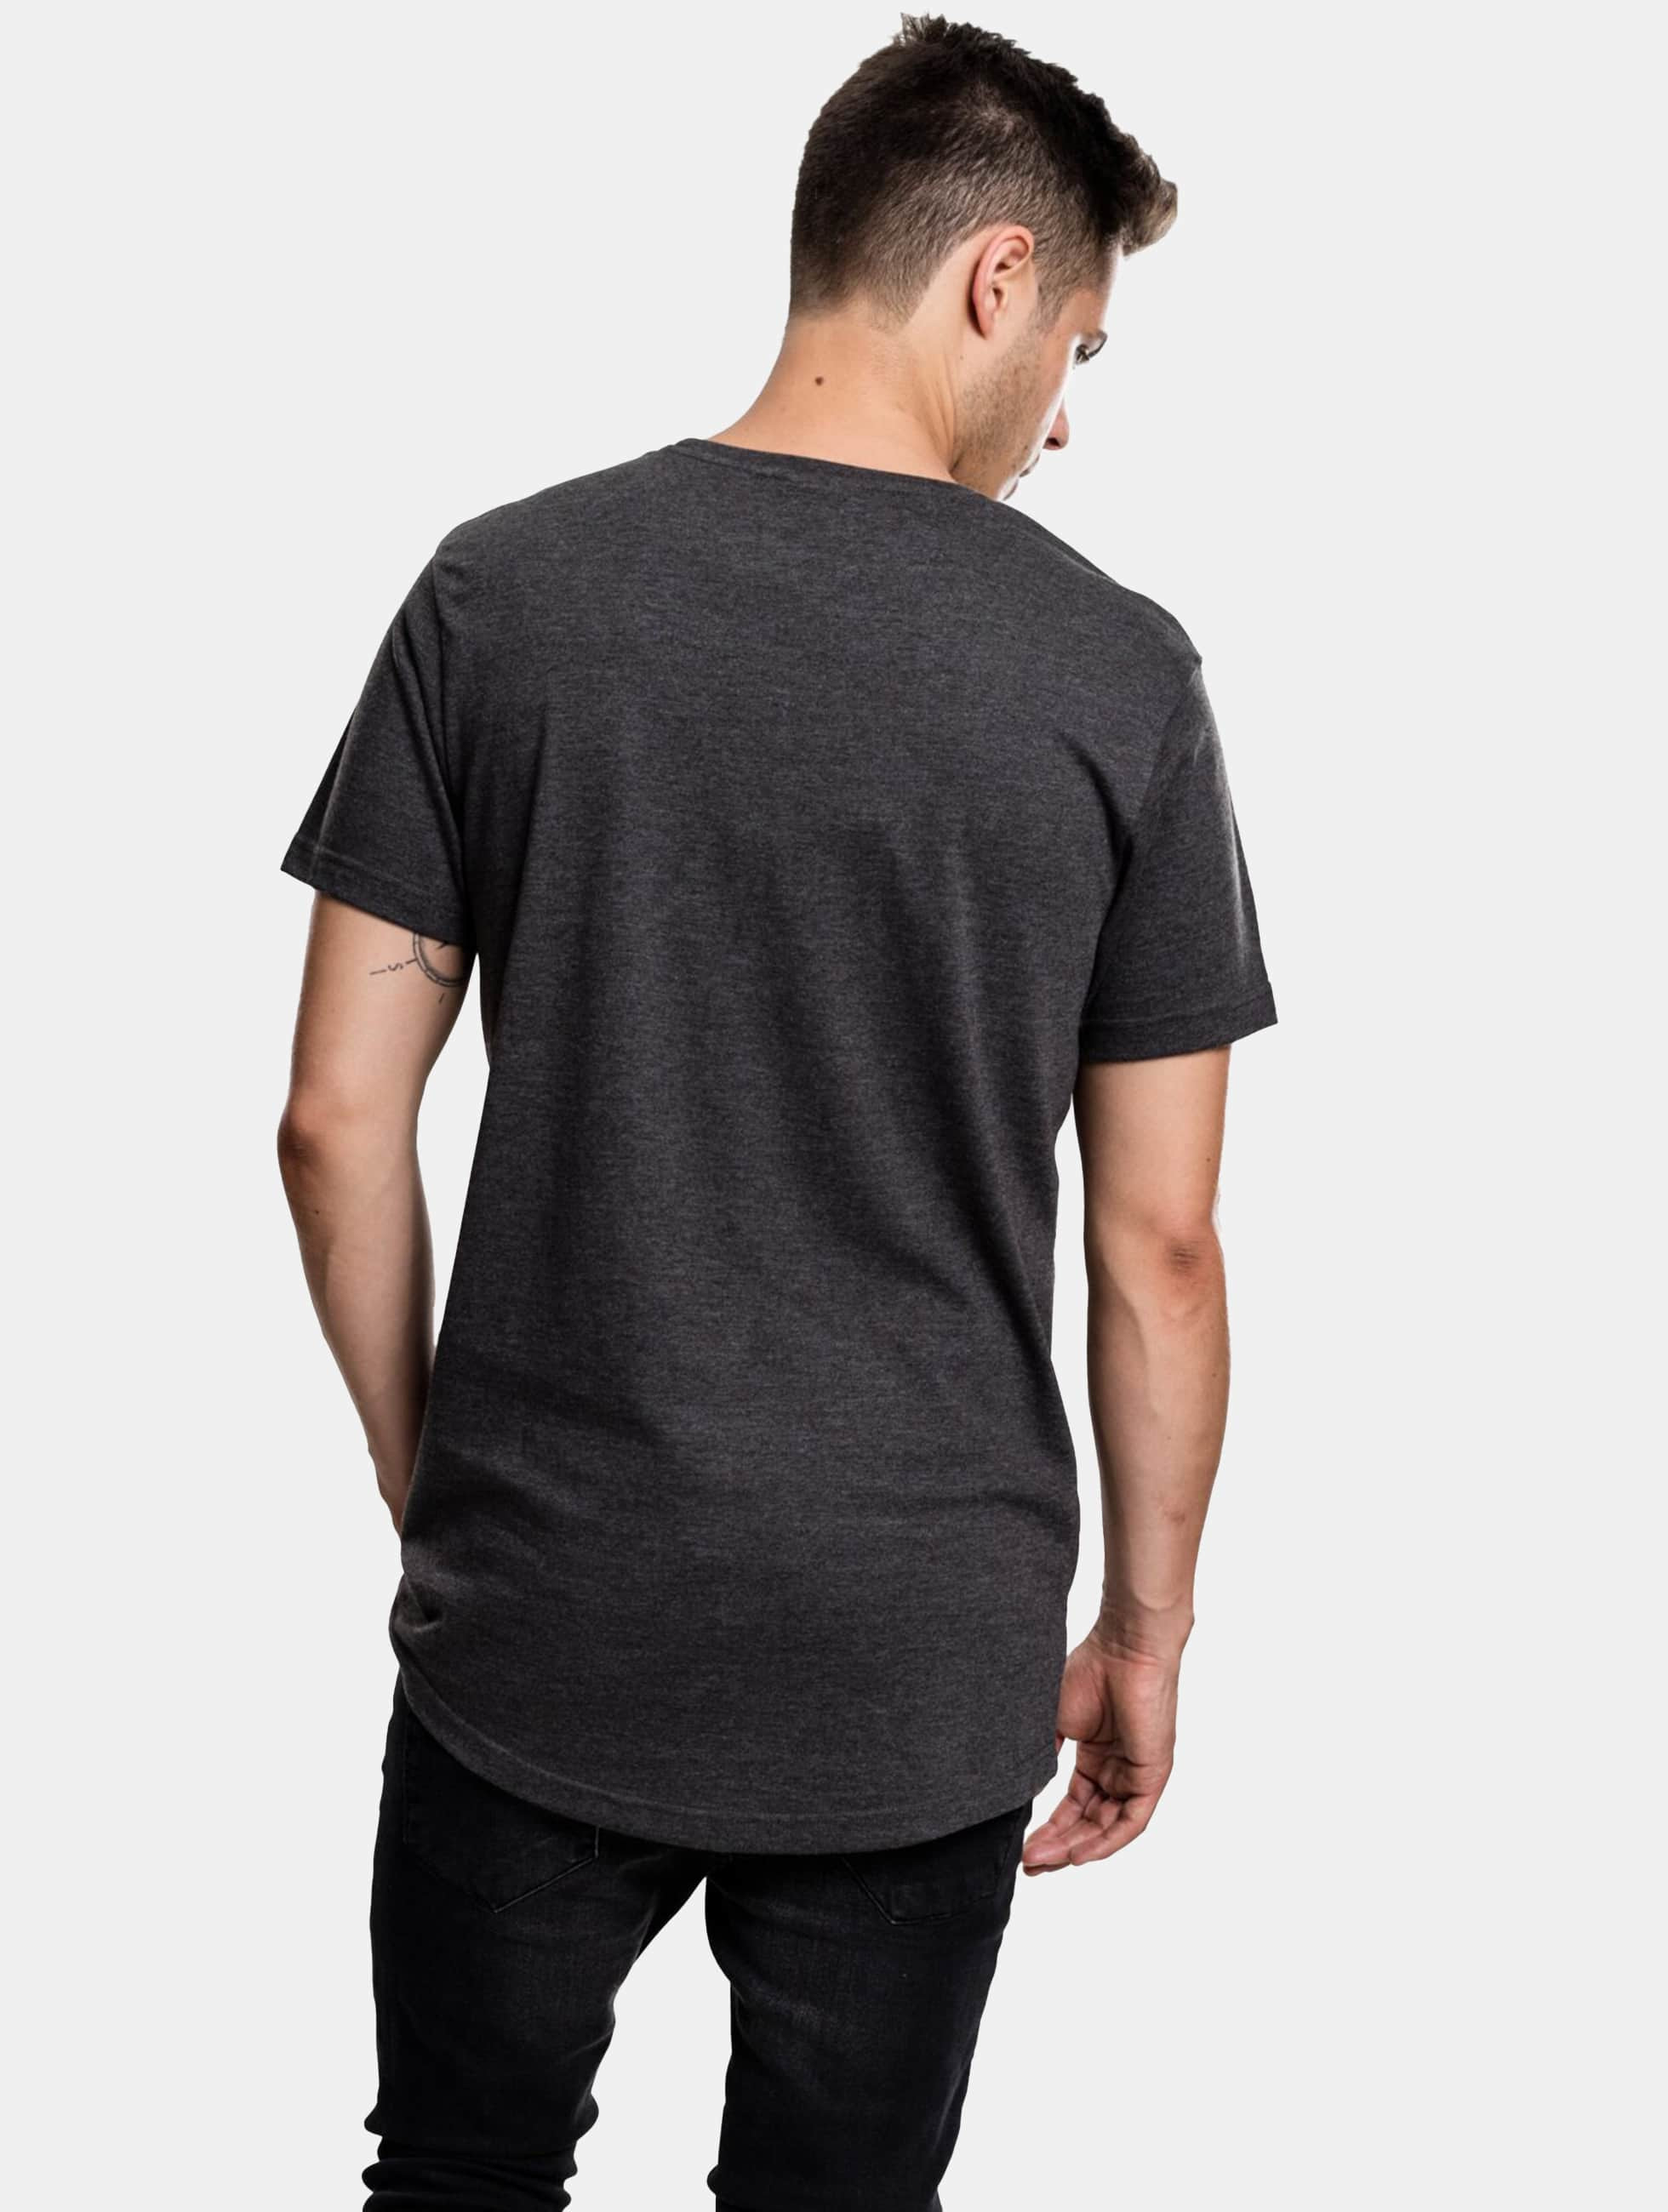 Urban Classics Tall Tees Shaped Melange Oversized Long grigio